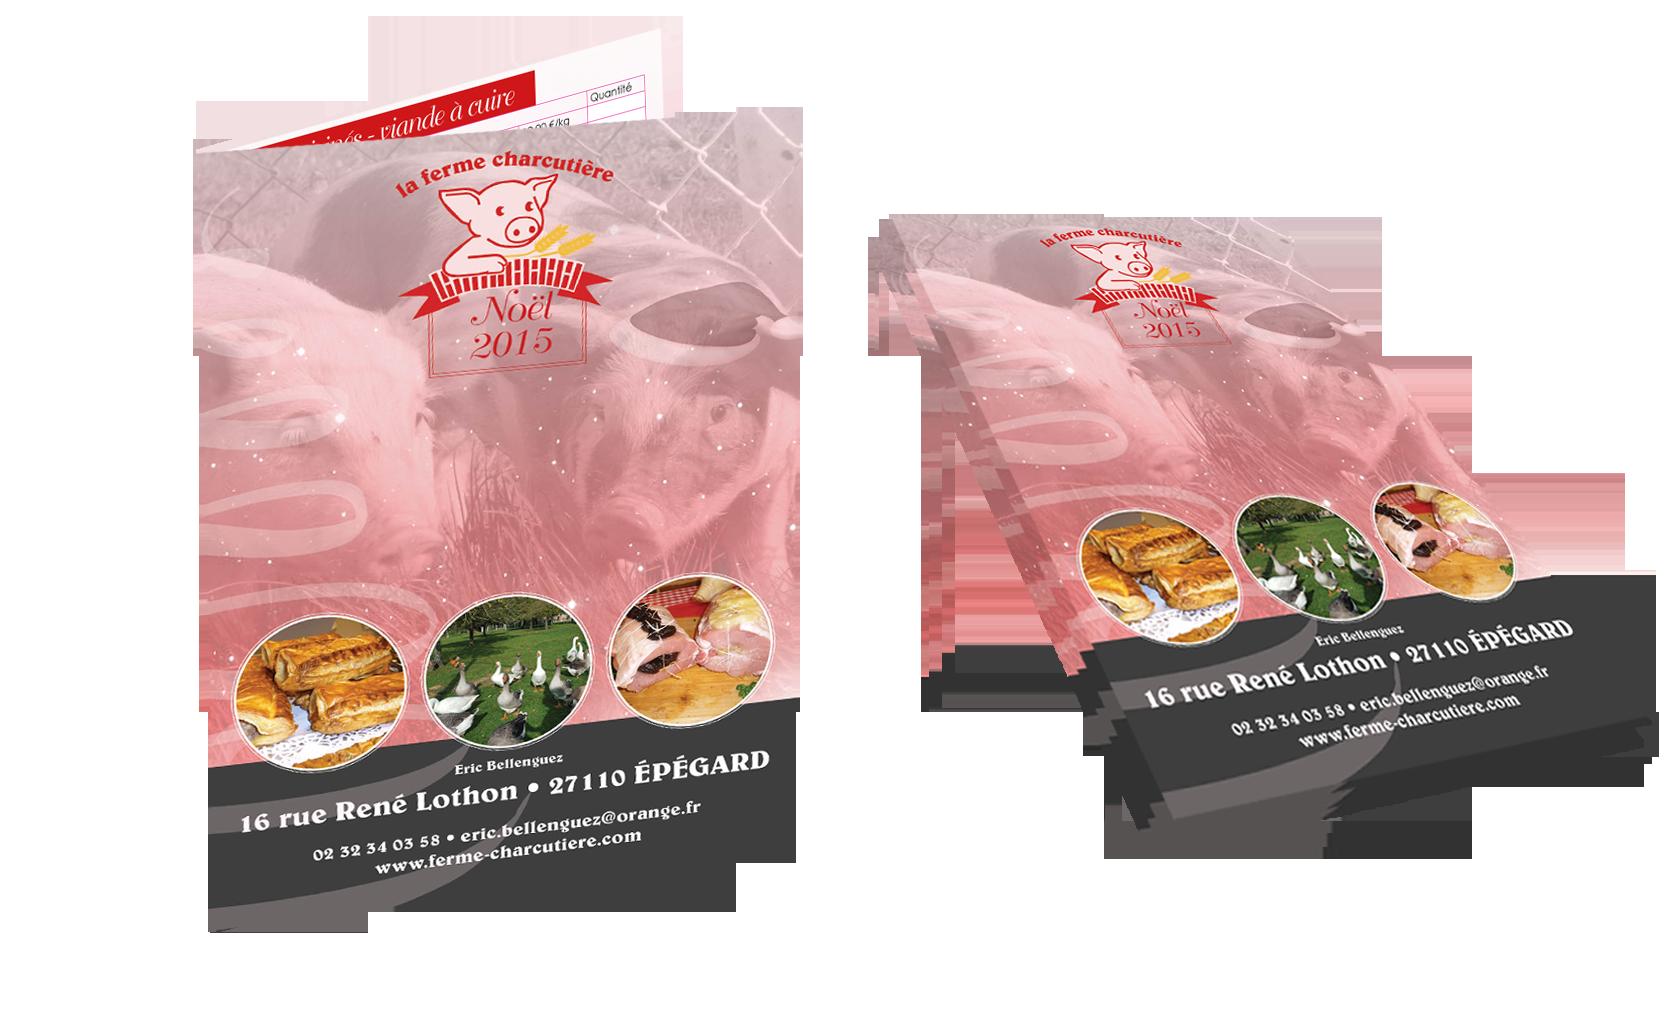 2015-11--ferme-charcutiere-edition-noel